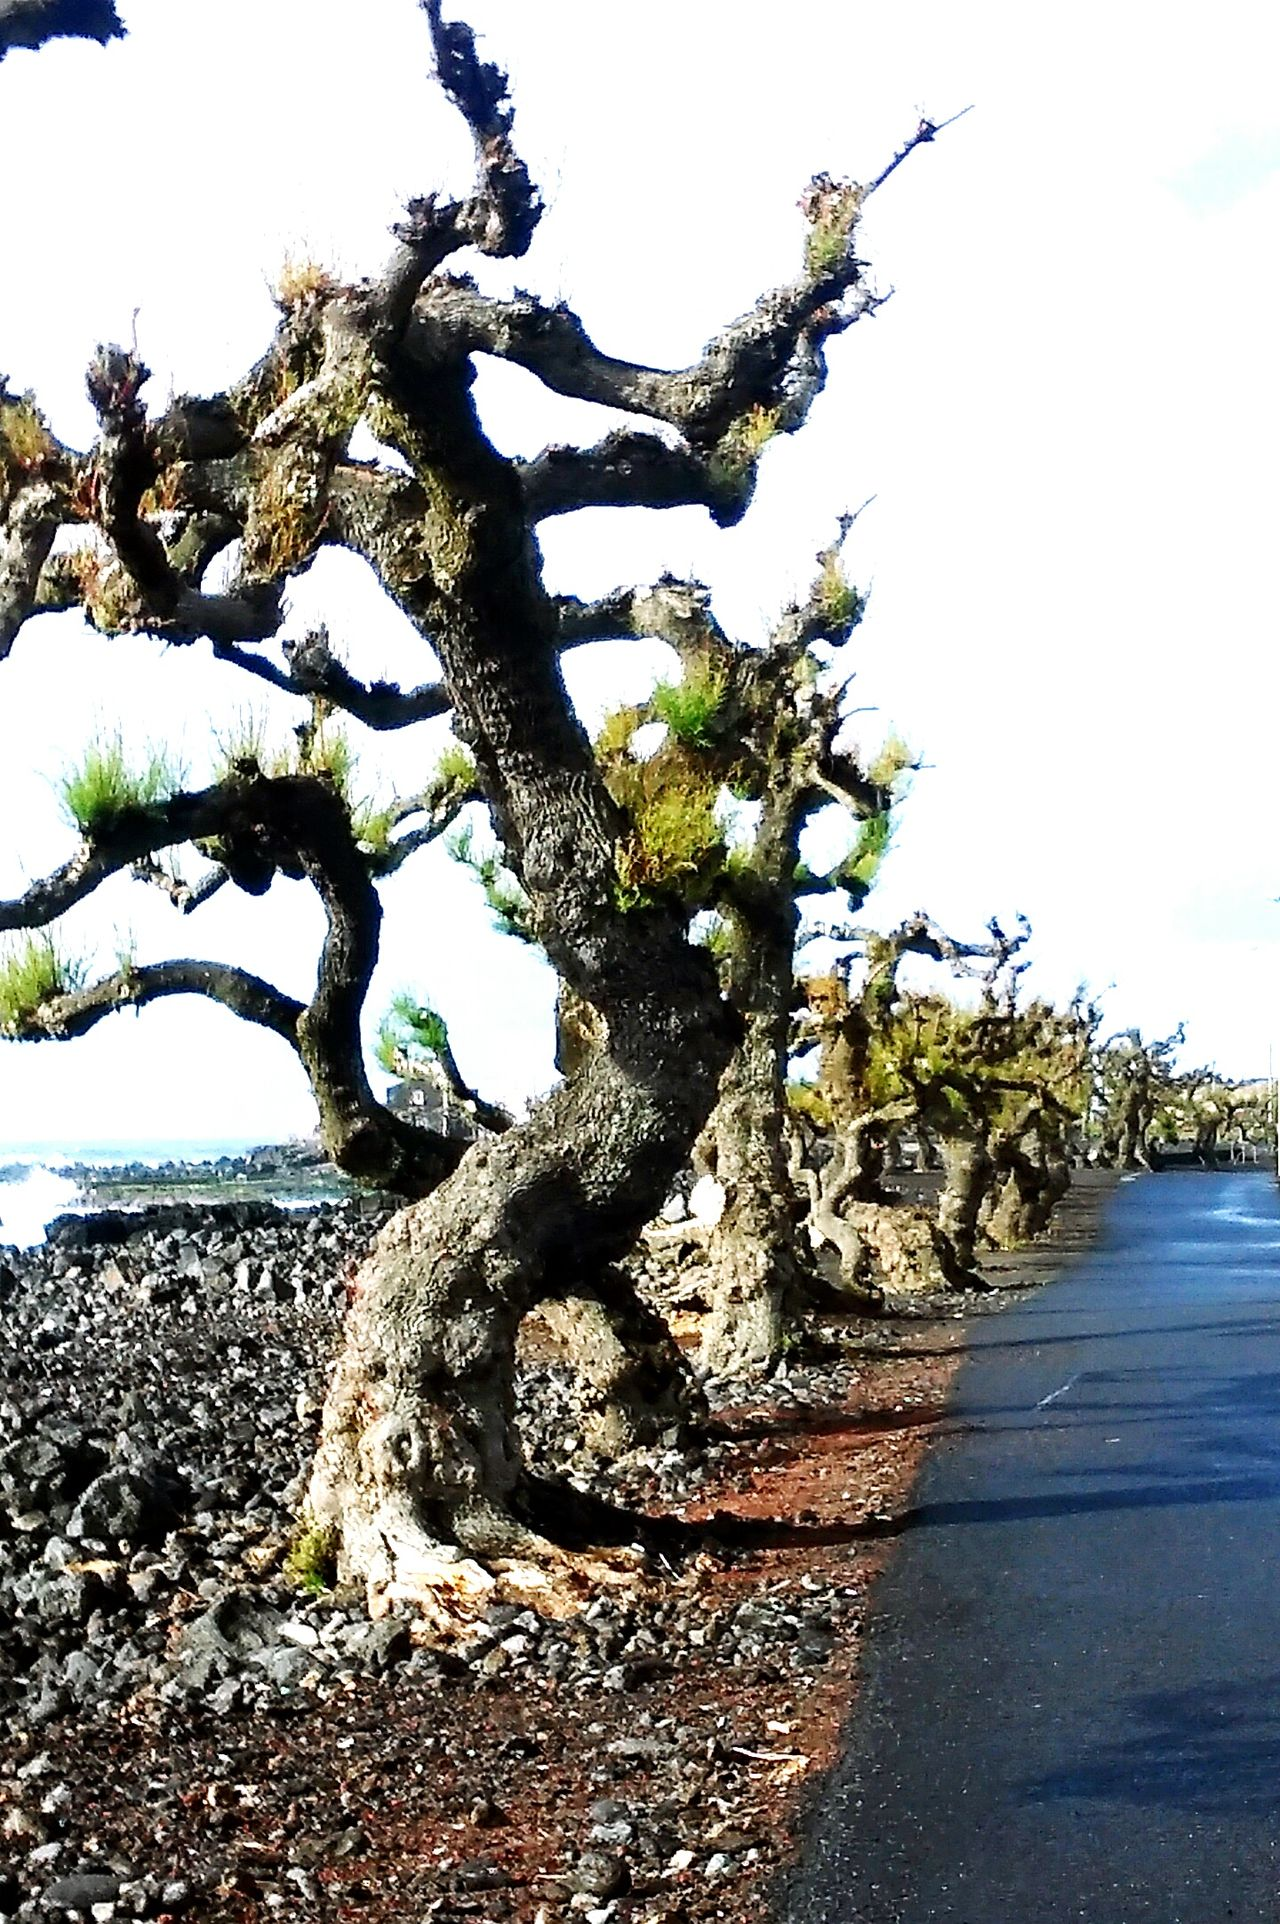 Pico Azores Ocean Plants 🌱 Atlantic Ocean Day Water Nature Tree Beach Outdoors Cloud - Sky Sky No People Beauty In Nature Sea Scenics